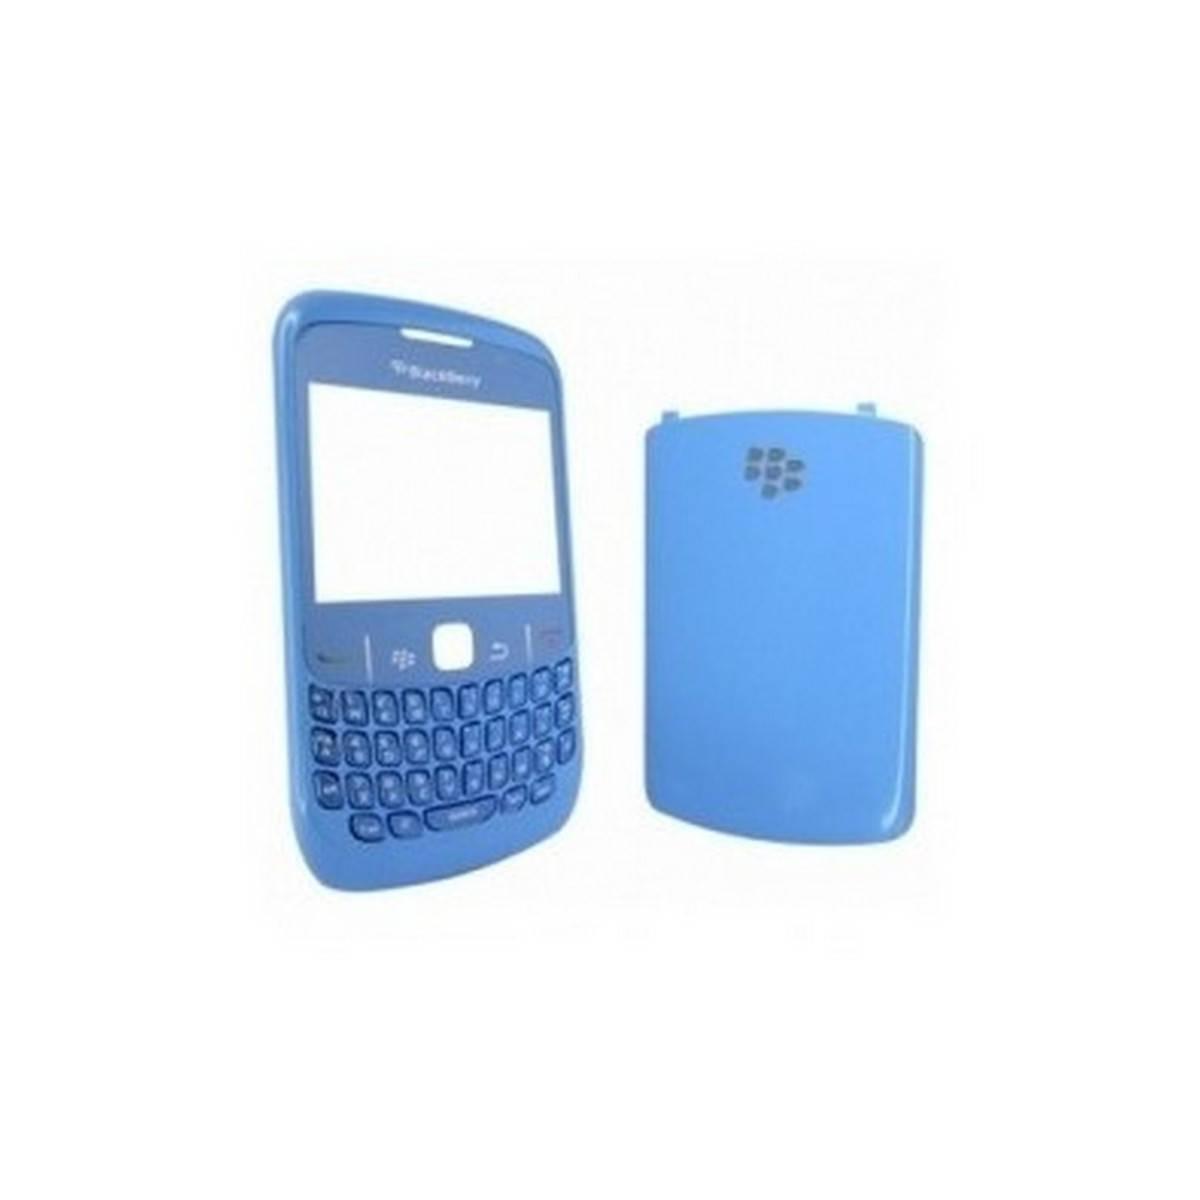 Carcaça BlackBerry 8520 azul cielo